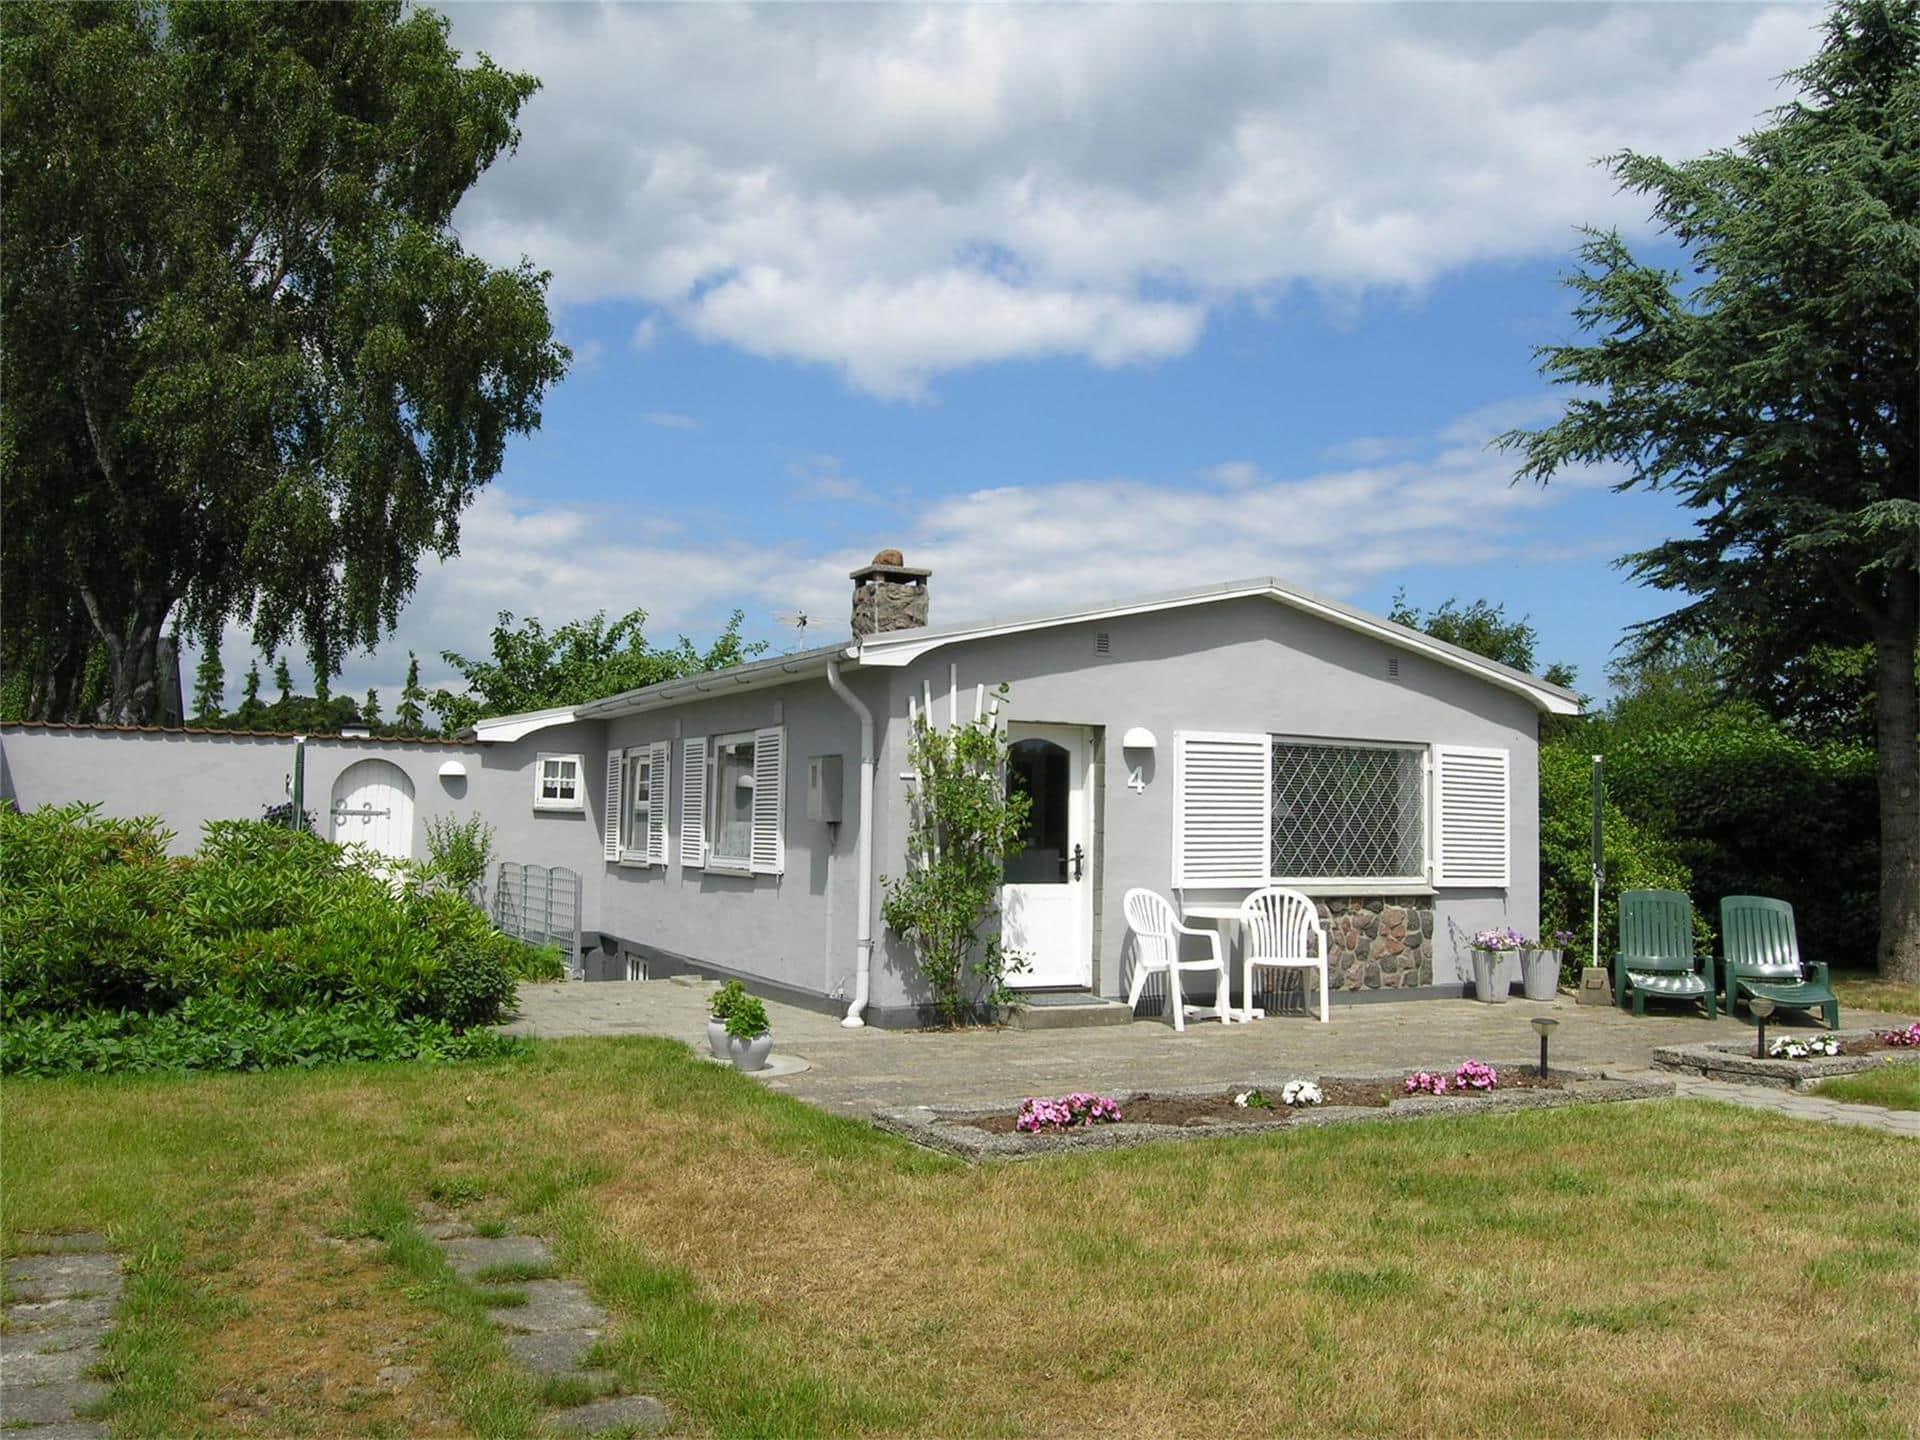 Bild 1-19 Ferienhaus 30182, Fjordvej 4, DK - 8340 Malling